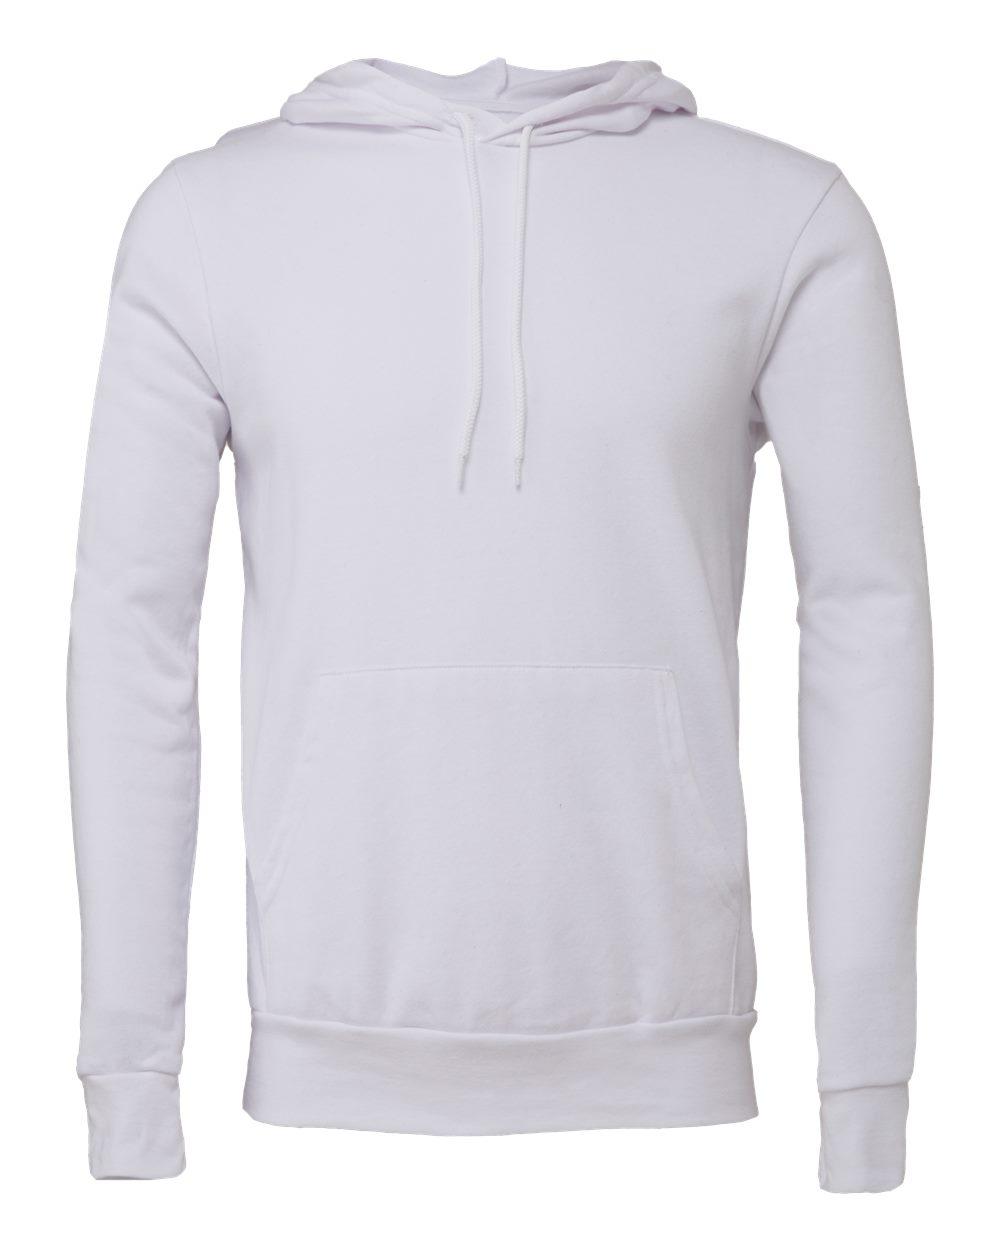 Bella-Canvas-Unisex-Sponge-Hooded-Pullover-Sweatshirt-Blank-3719-up-to-2XL thumbnail 103